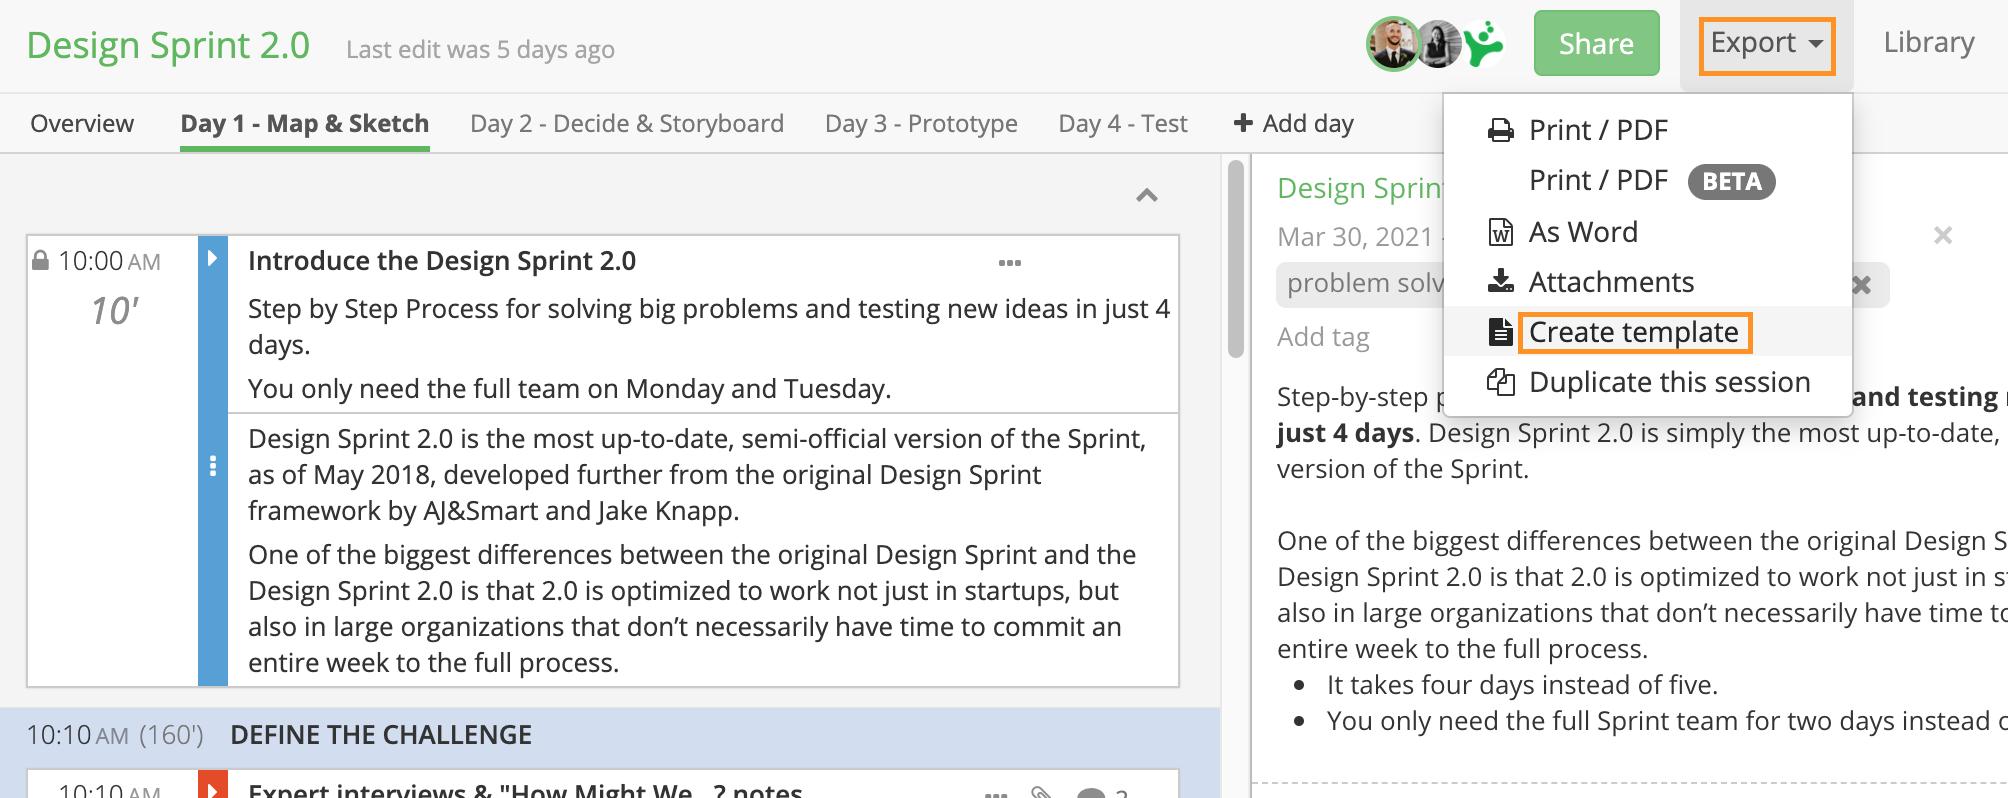 Create template - community